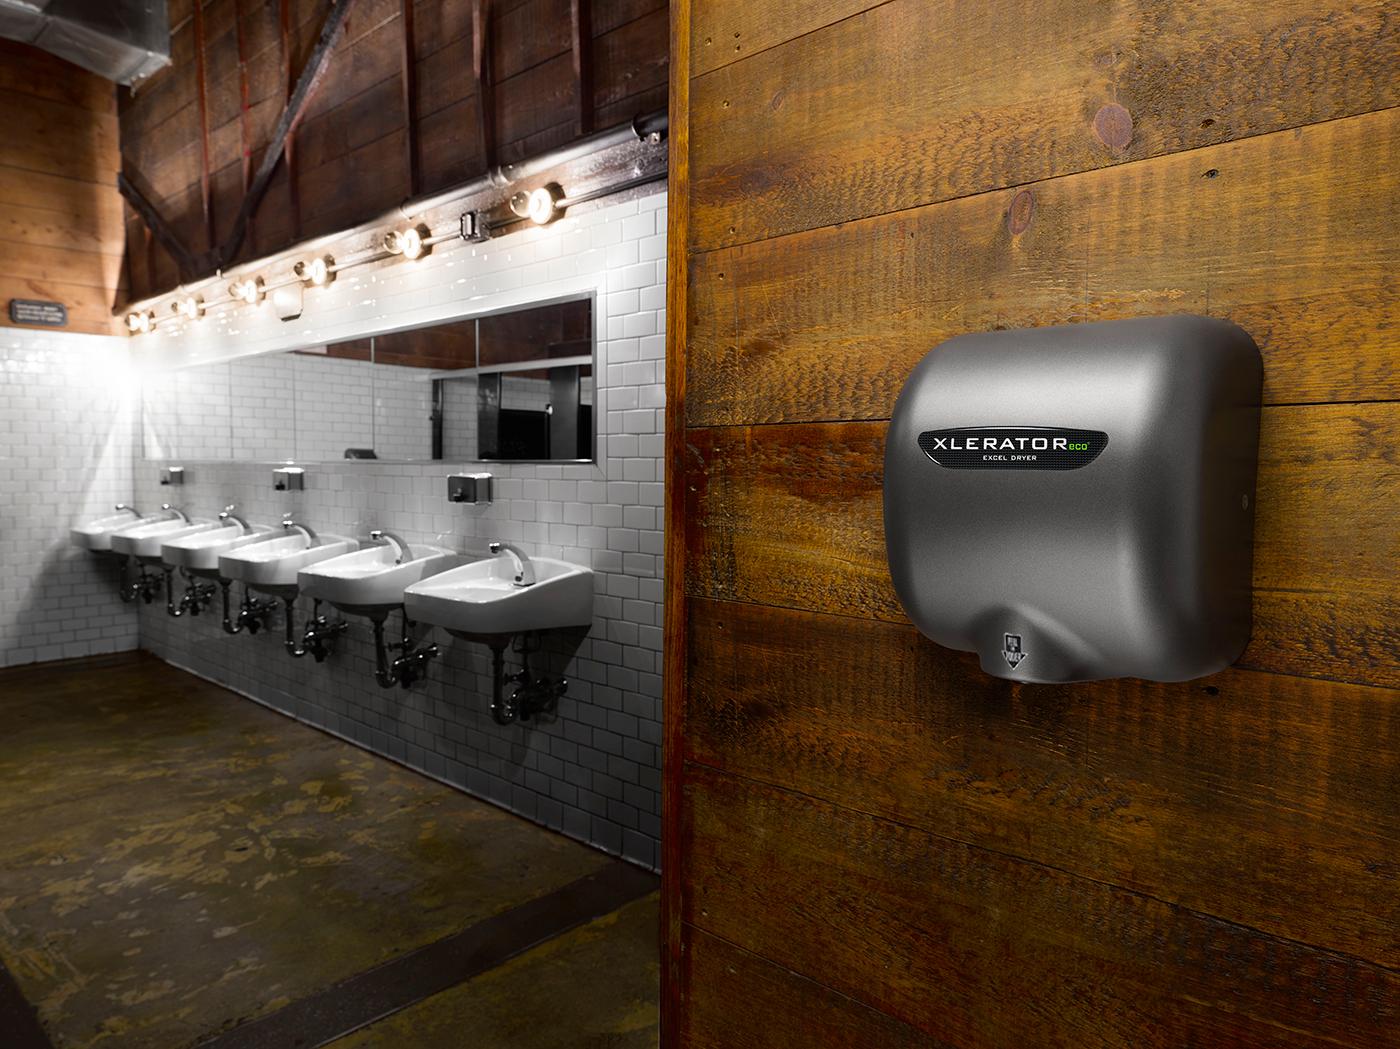 Xlerator Hand Dryer Manual 277 Volt Wiring Diagram Made In Usa Certified Xleratoreco Dryers